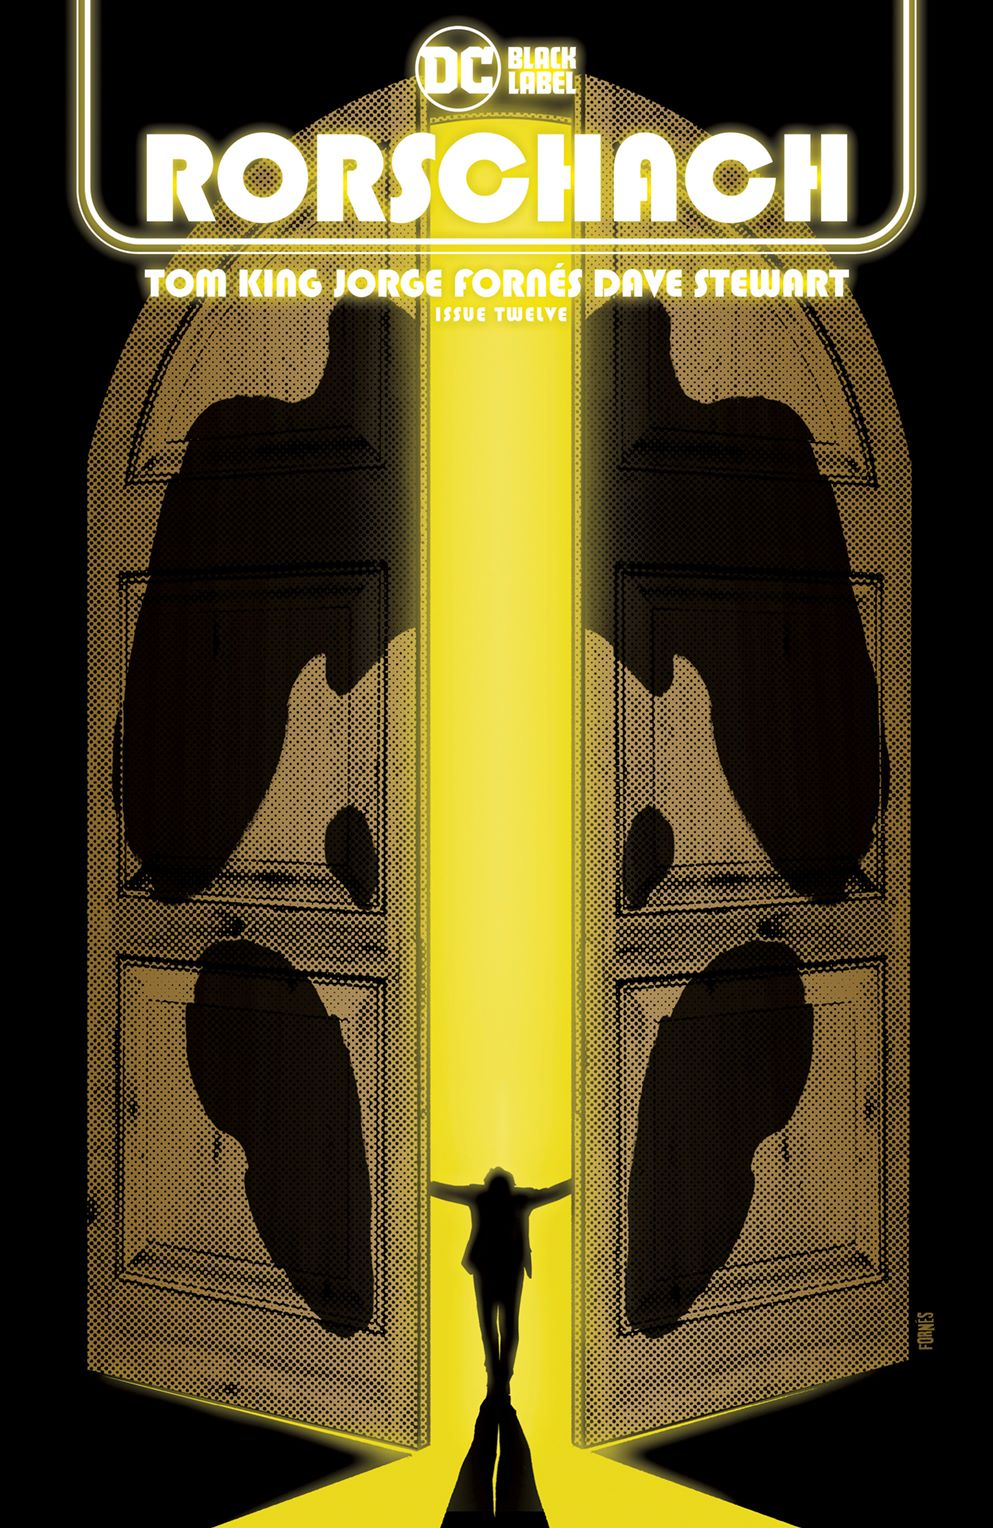 RORSCHACH_Cv12_01211 DC Comics September 2021 Solicitations